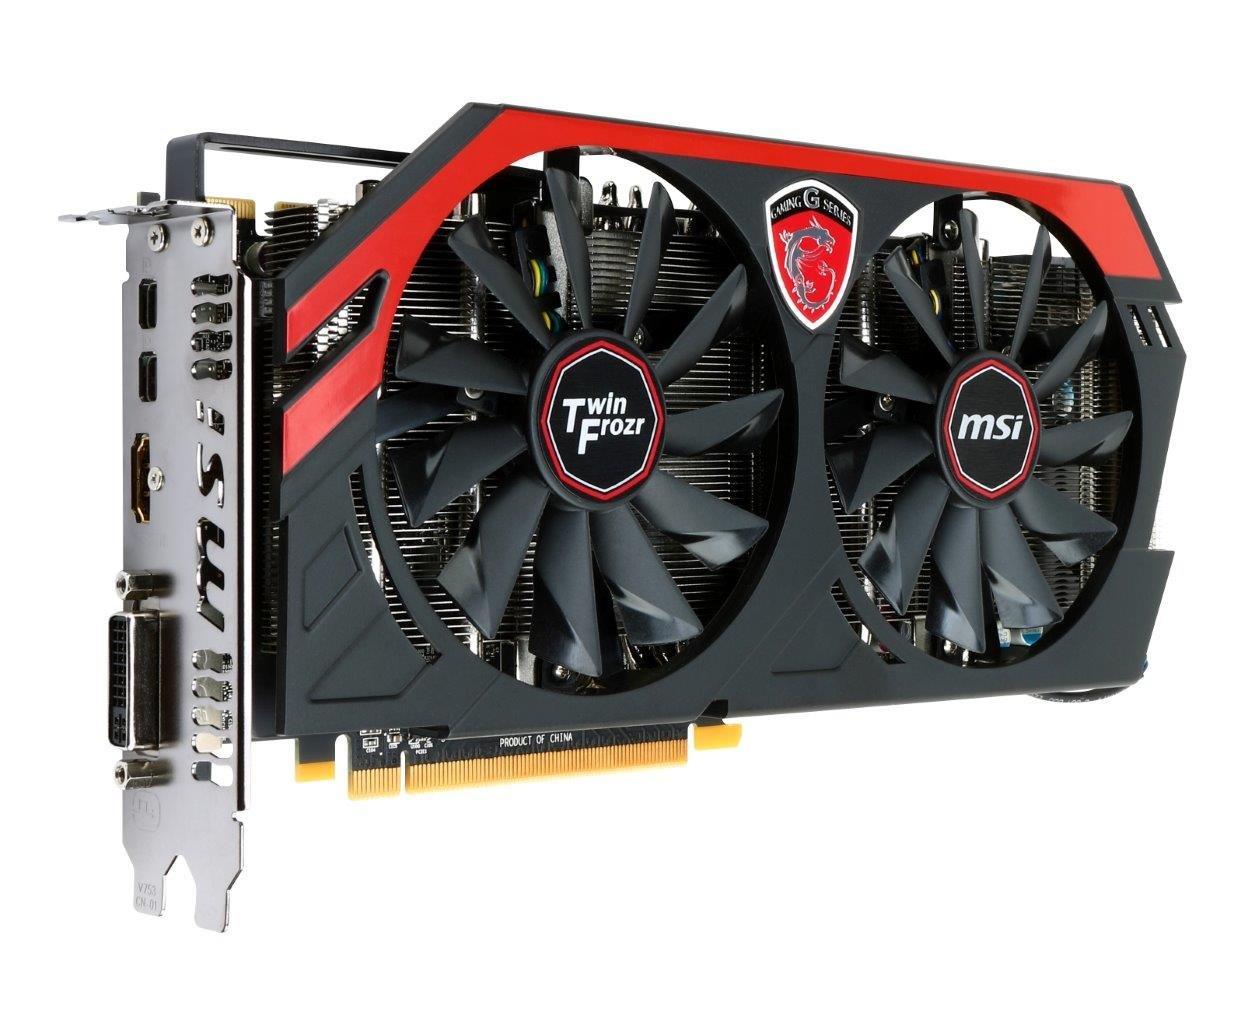 MSI AMD Radeon R9 280X, 3GB GDDR5, PCI Express 3 0 Graphics Card R9 280X  Gaming 3G